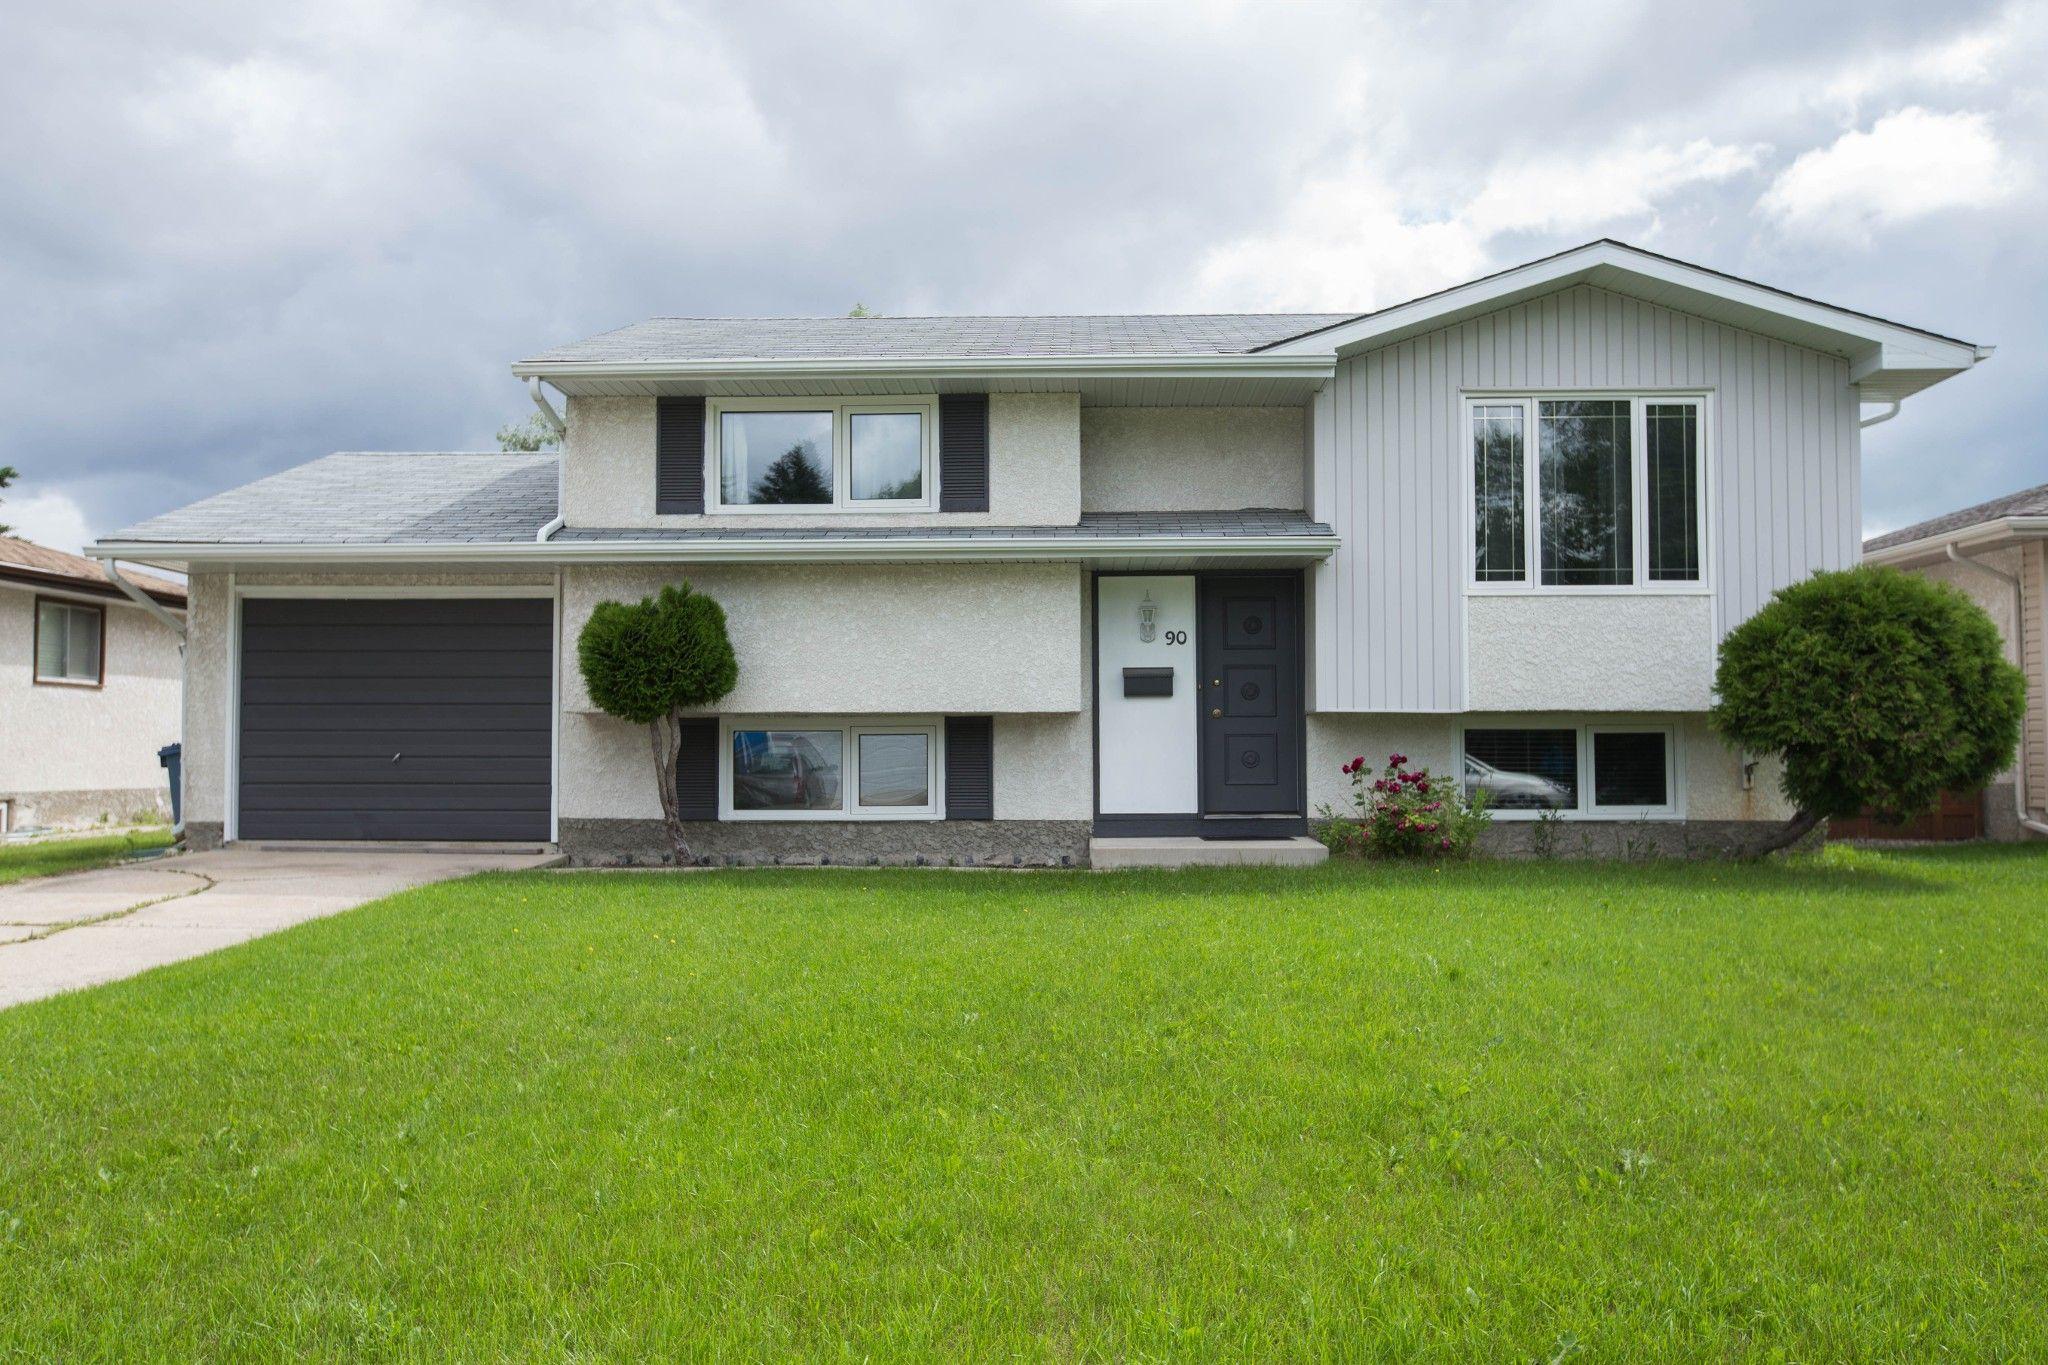 Main Photo: 90 Newcastle Road in Winnipeg: Fort Richmond House for sale (1K)  : MLS®# 1716810